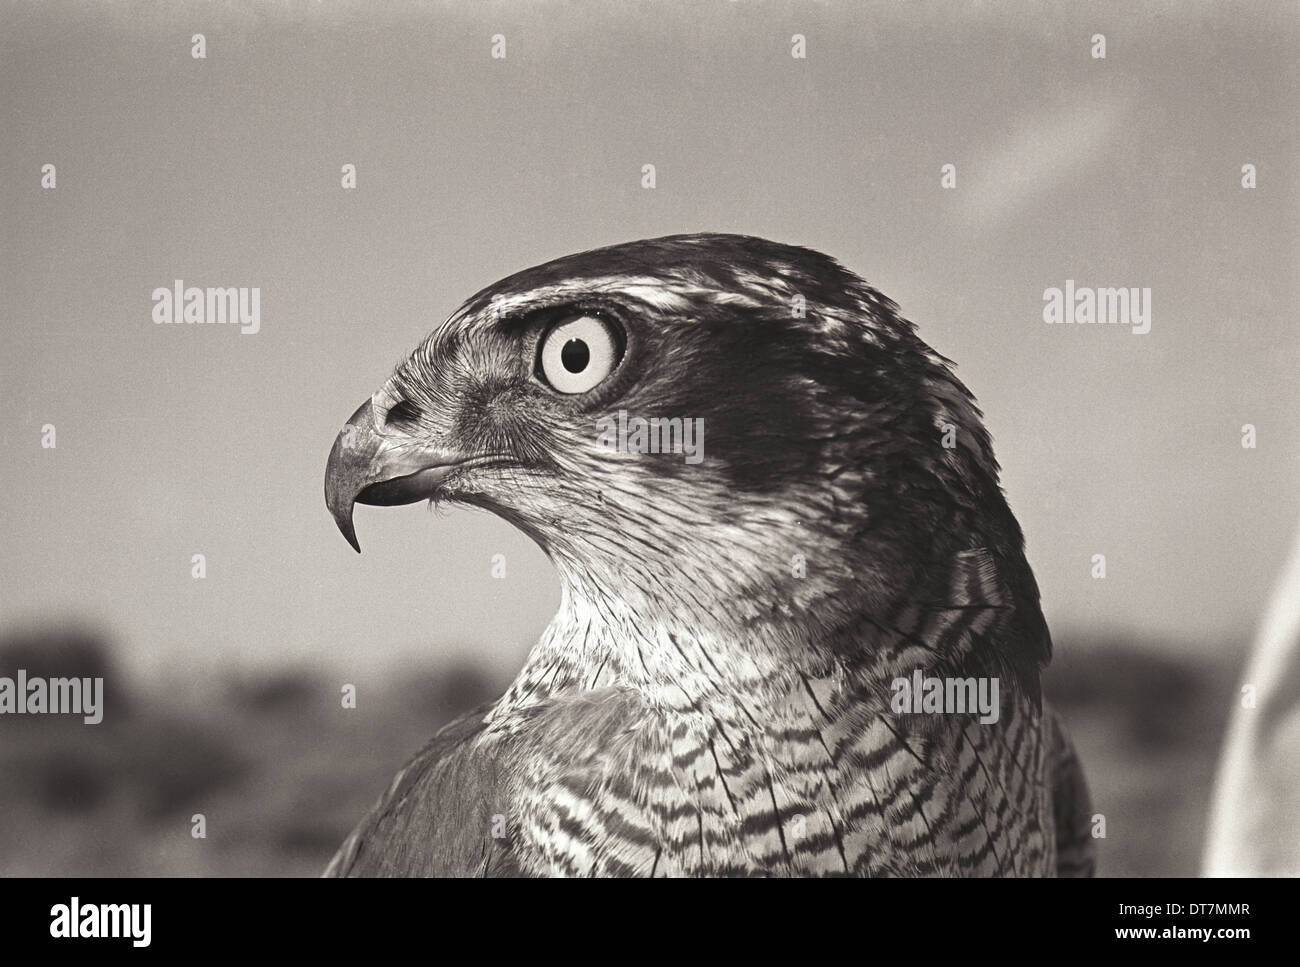 Goshawk, November 1966, Contarex camera, 50mm planar lens. f/11, 1/250th, Pan- x Film - Stock Image